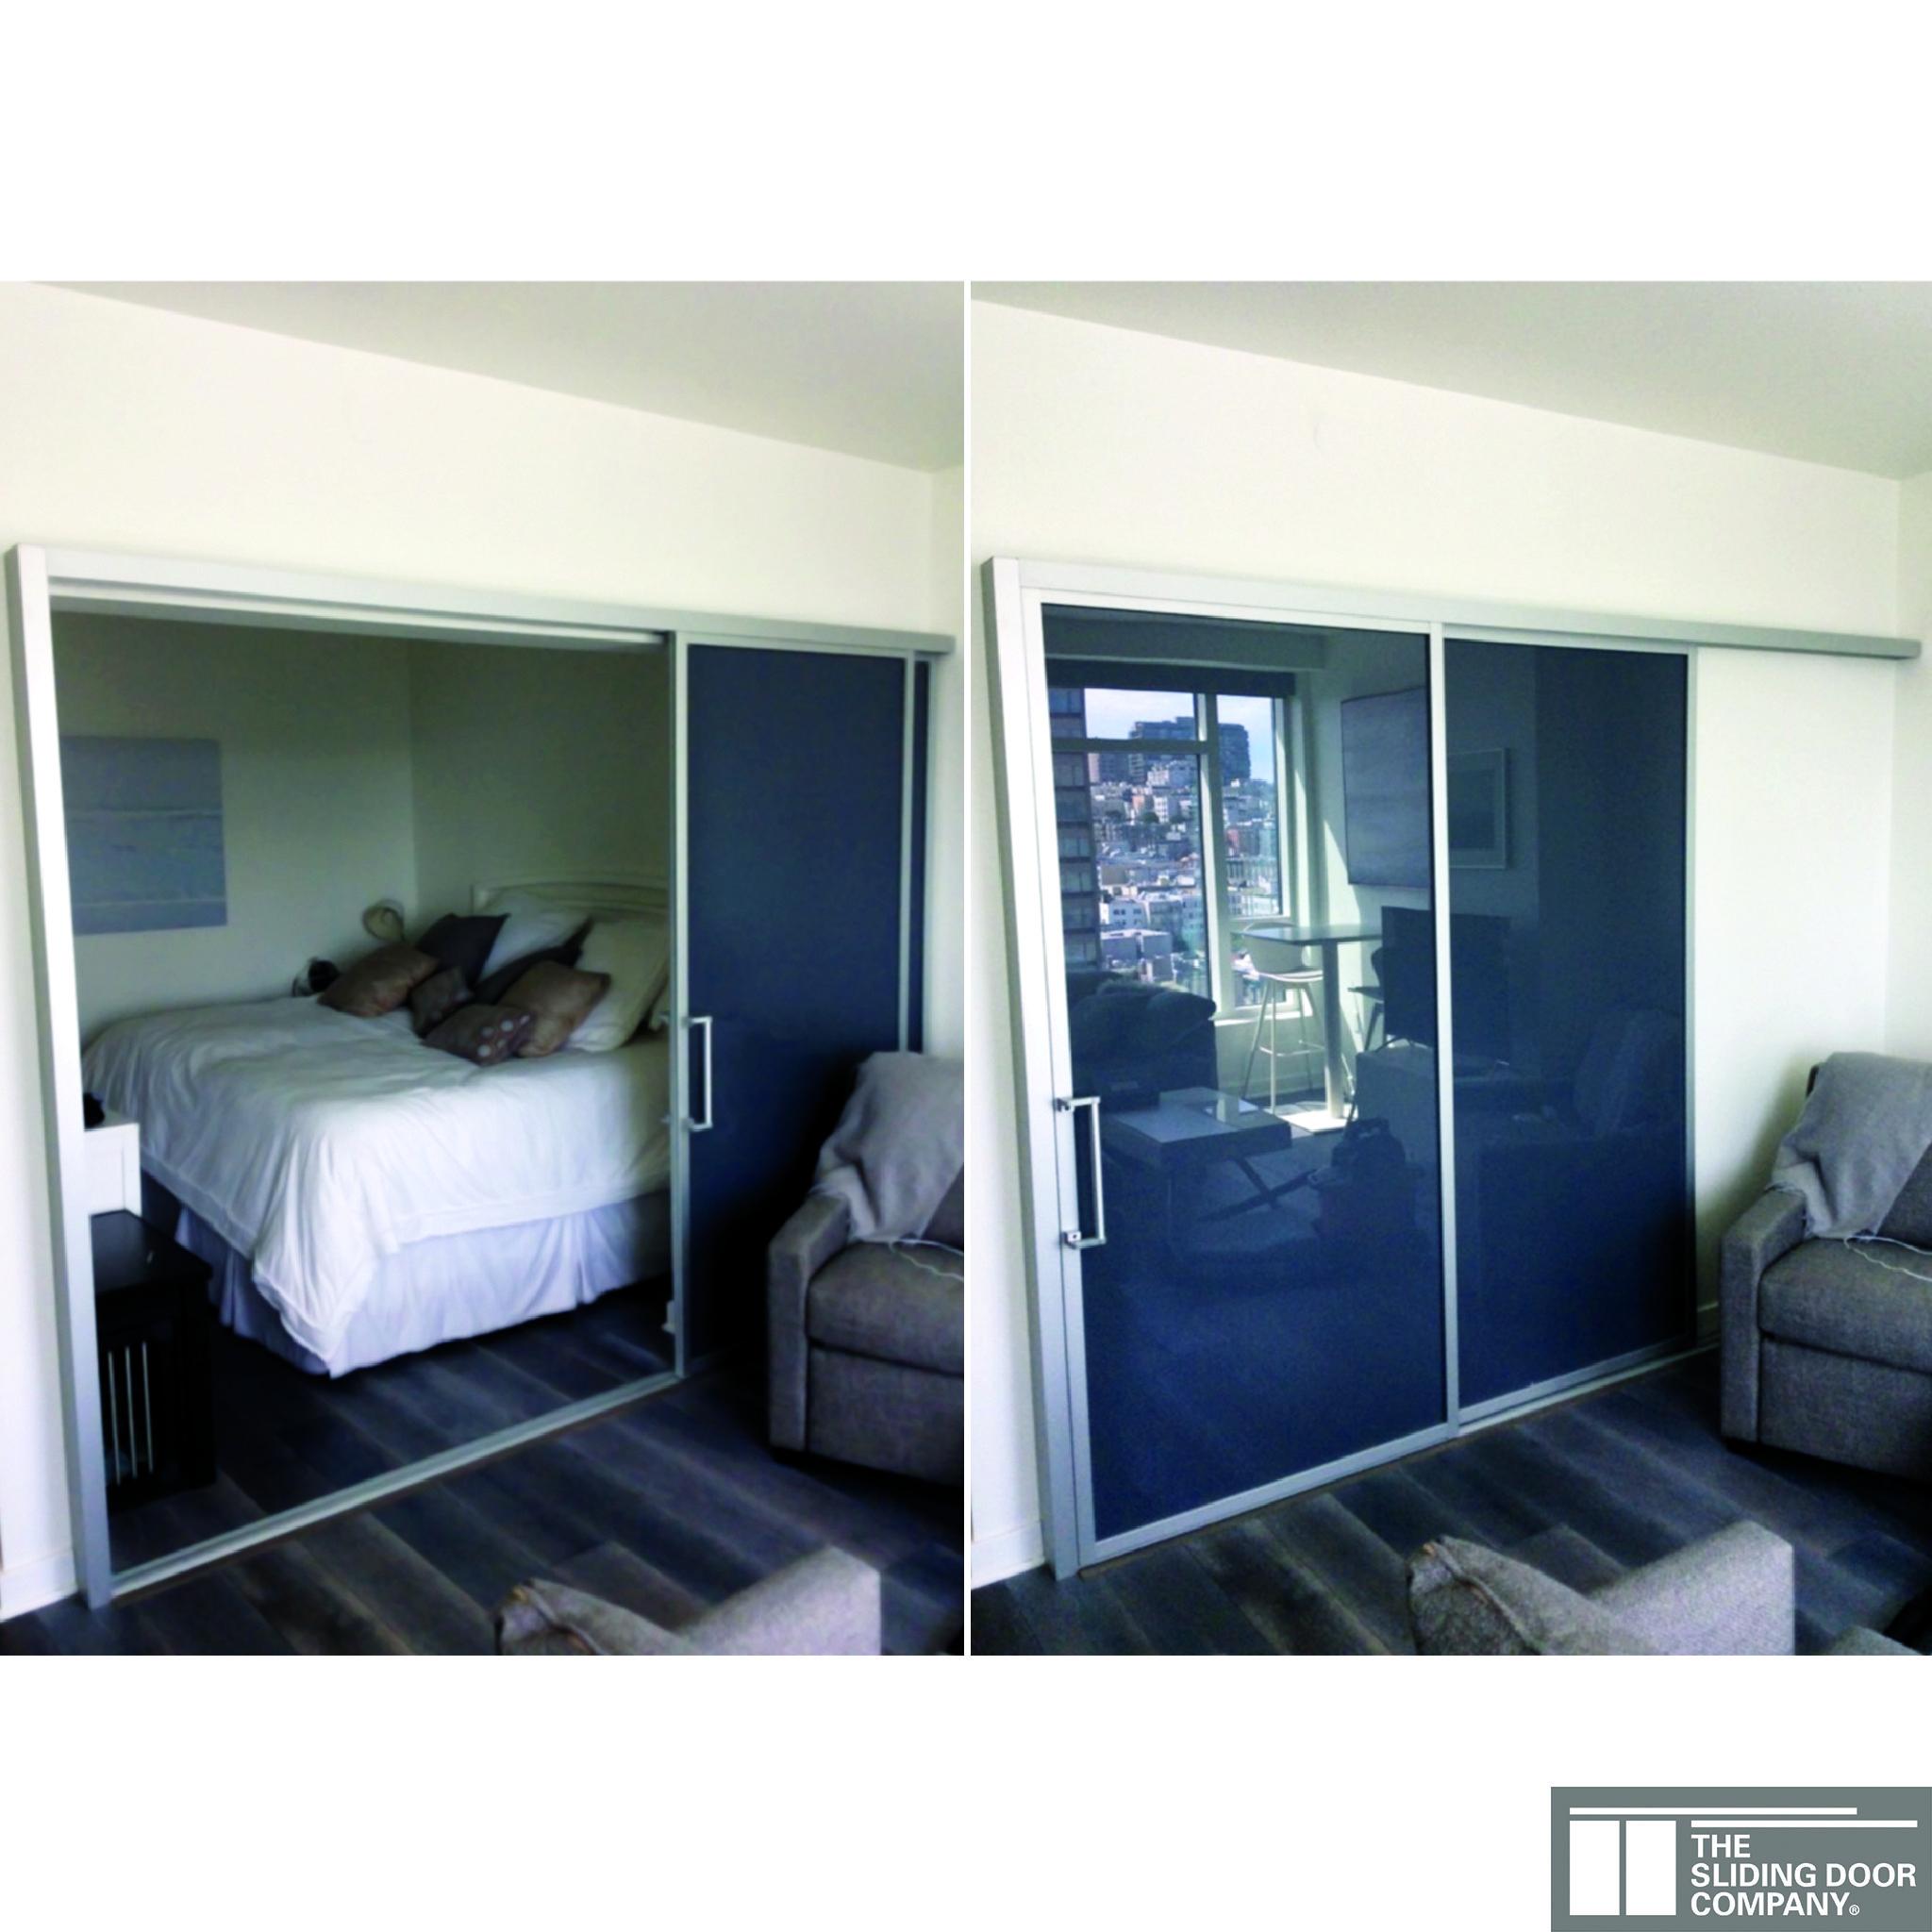 Interior Glass Sliding Doors The Sliding Door Company Door Dividers Sliding Glass Door Sliding Doors